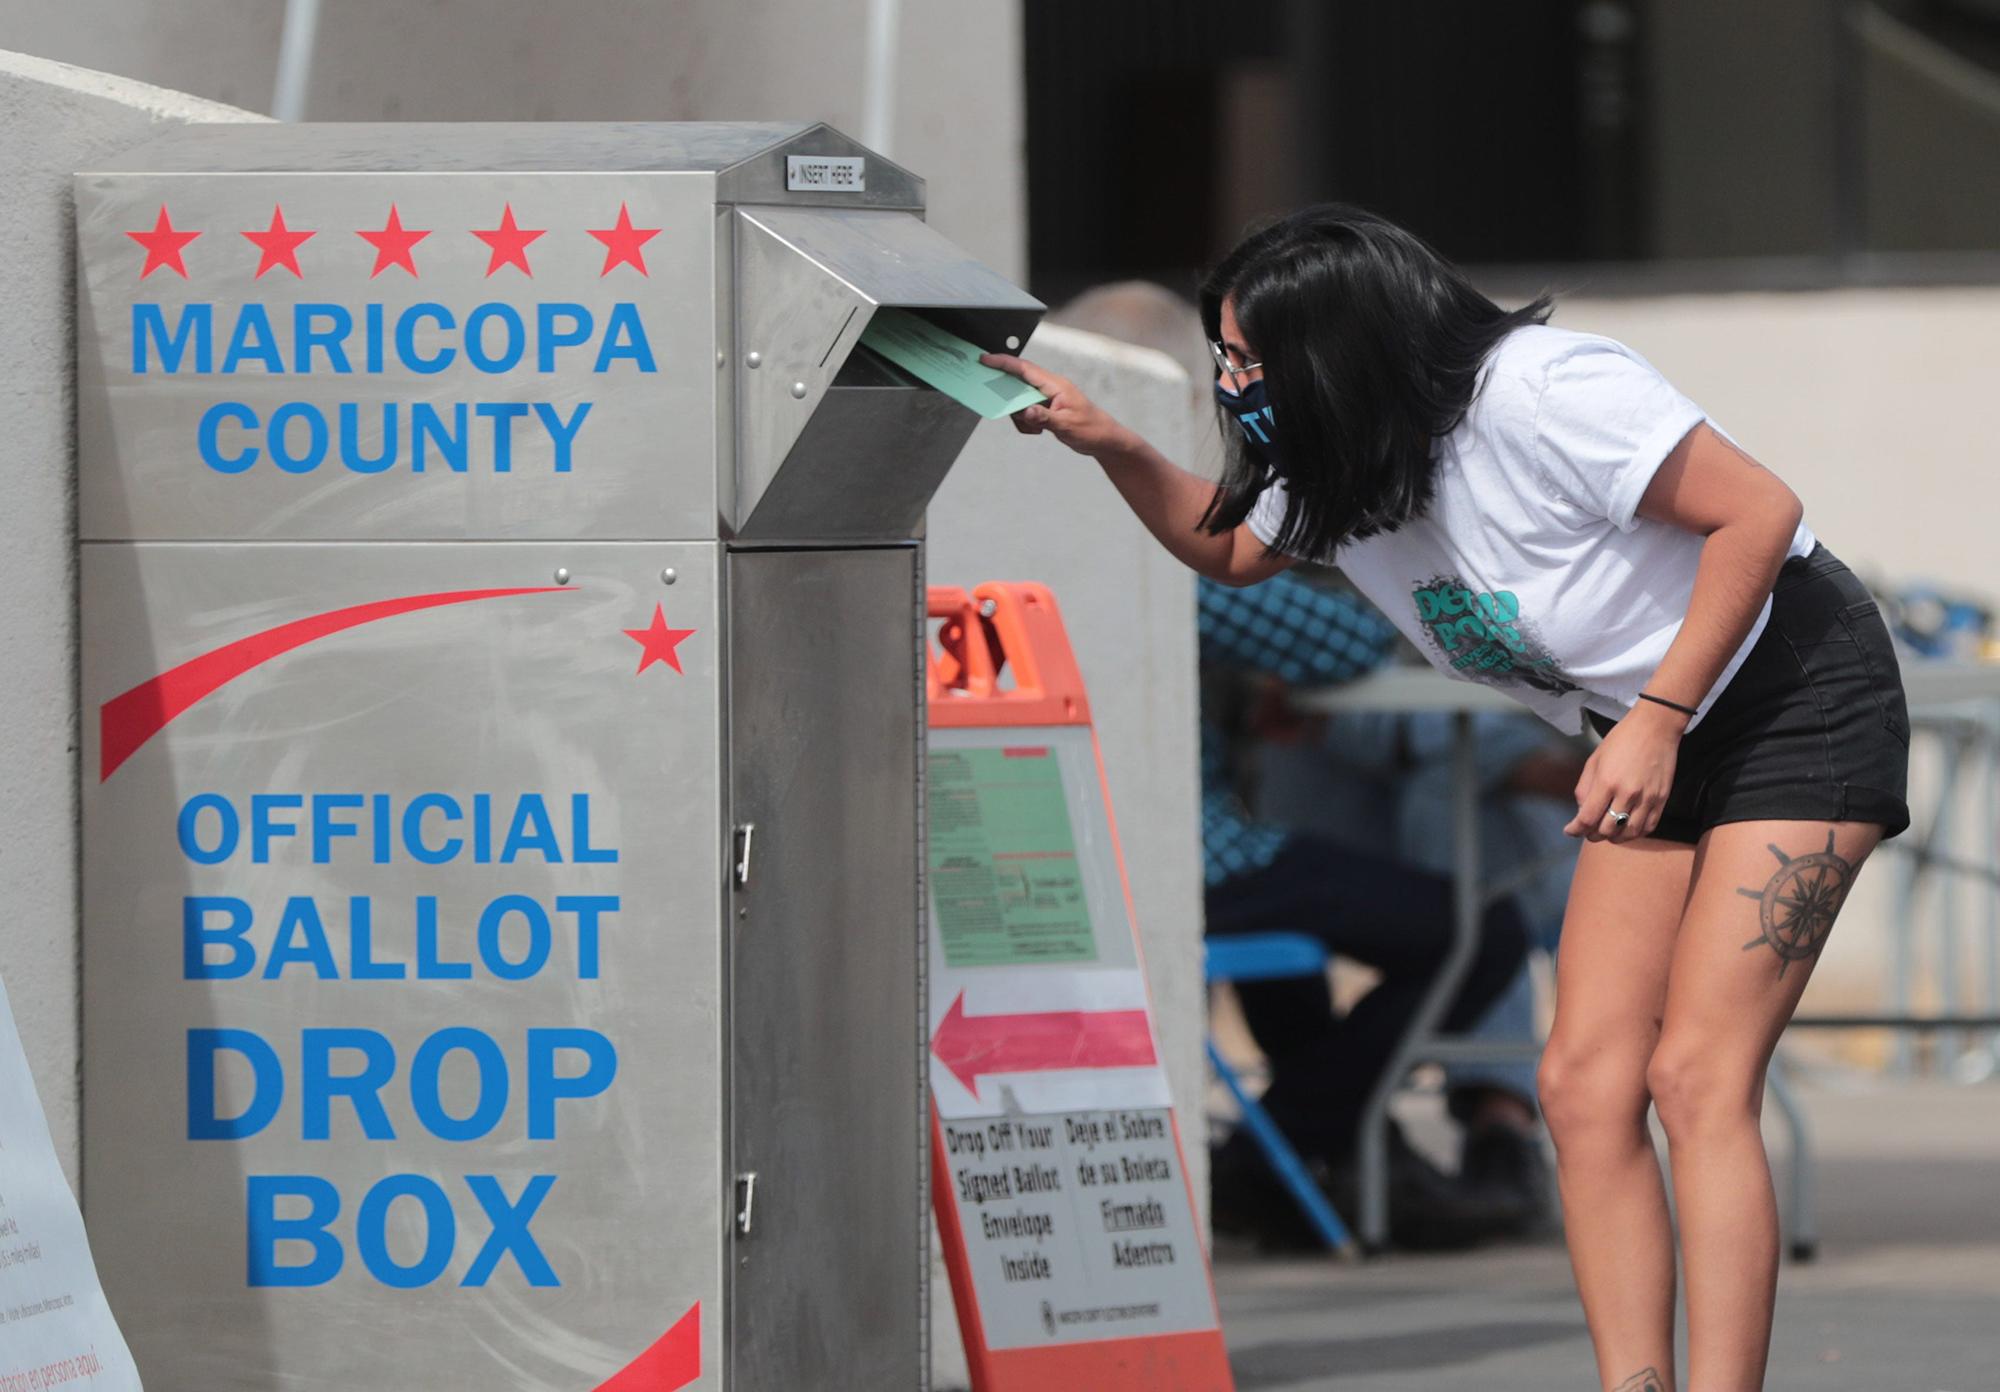 Arizona Republic: Trump allies pressured Maricopa County election supervisors